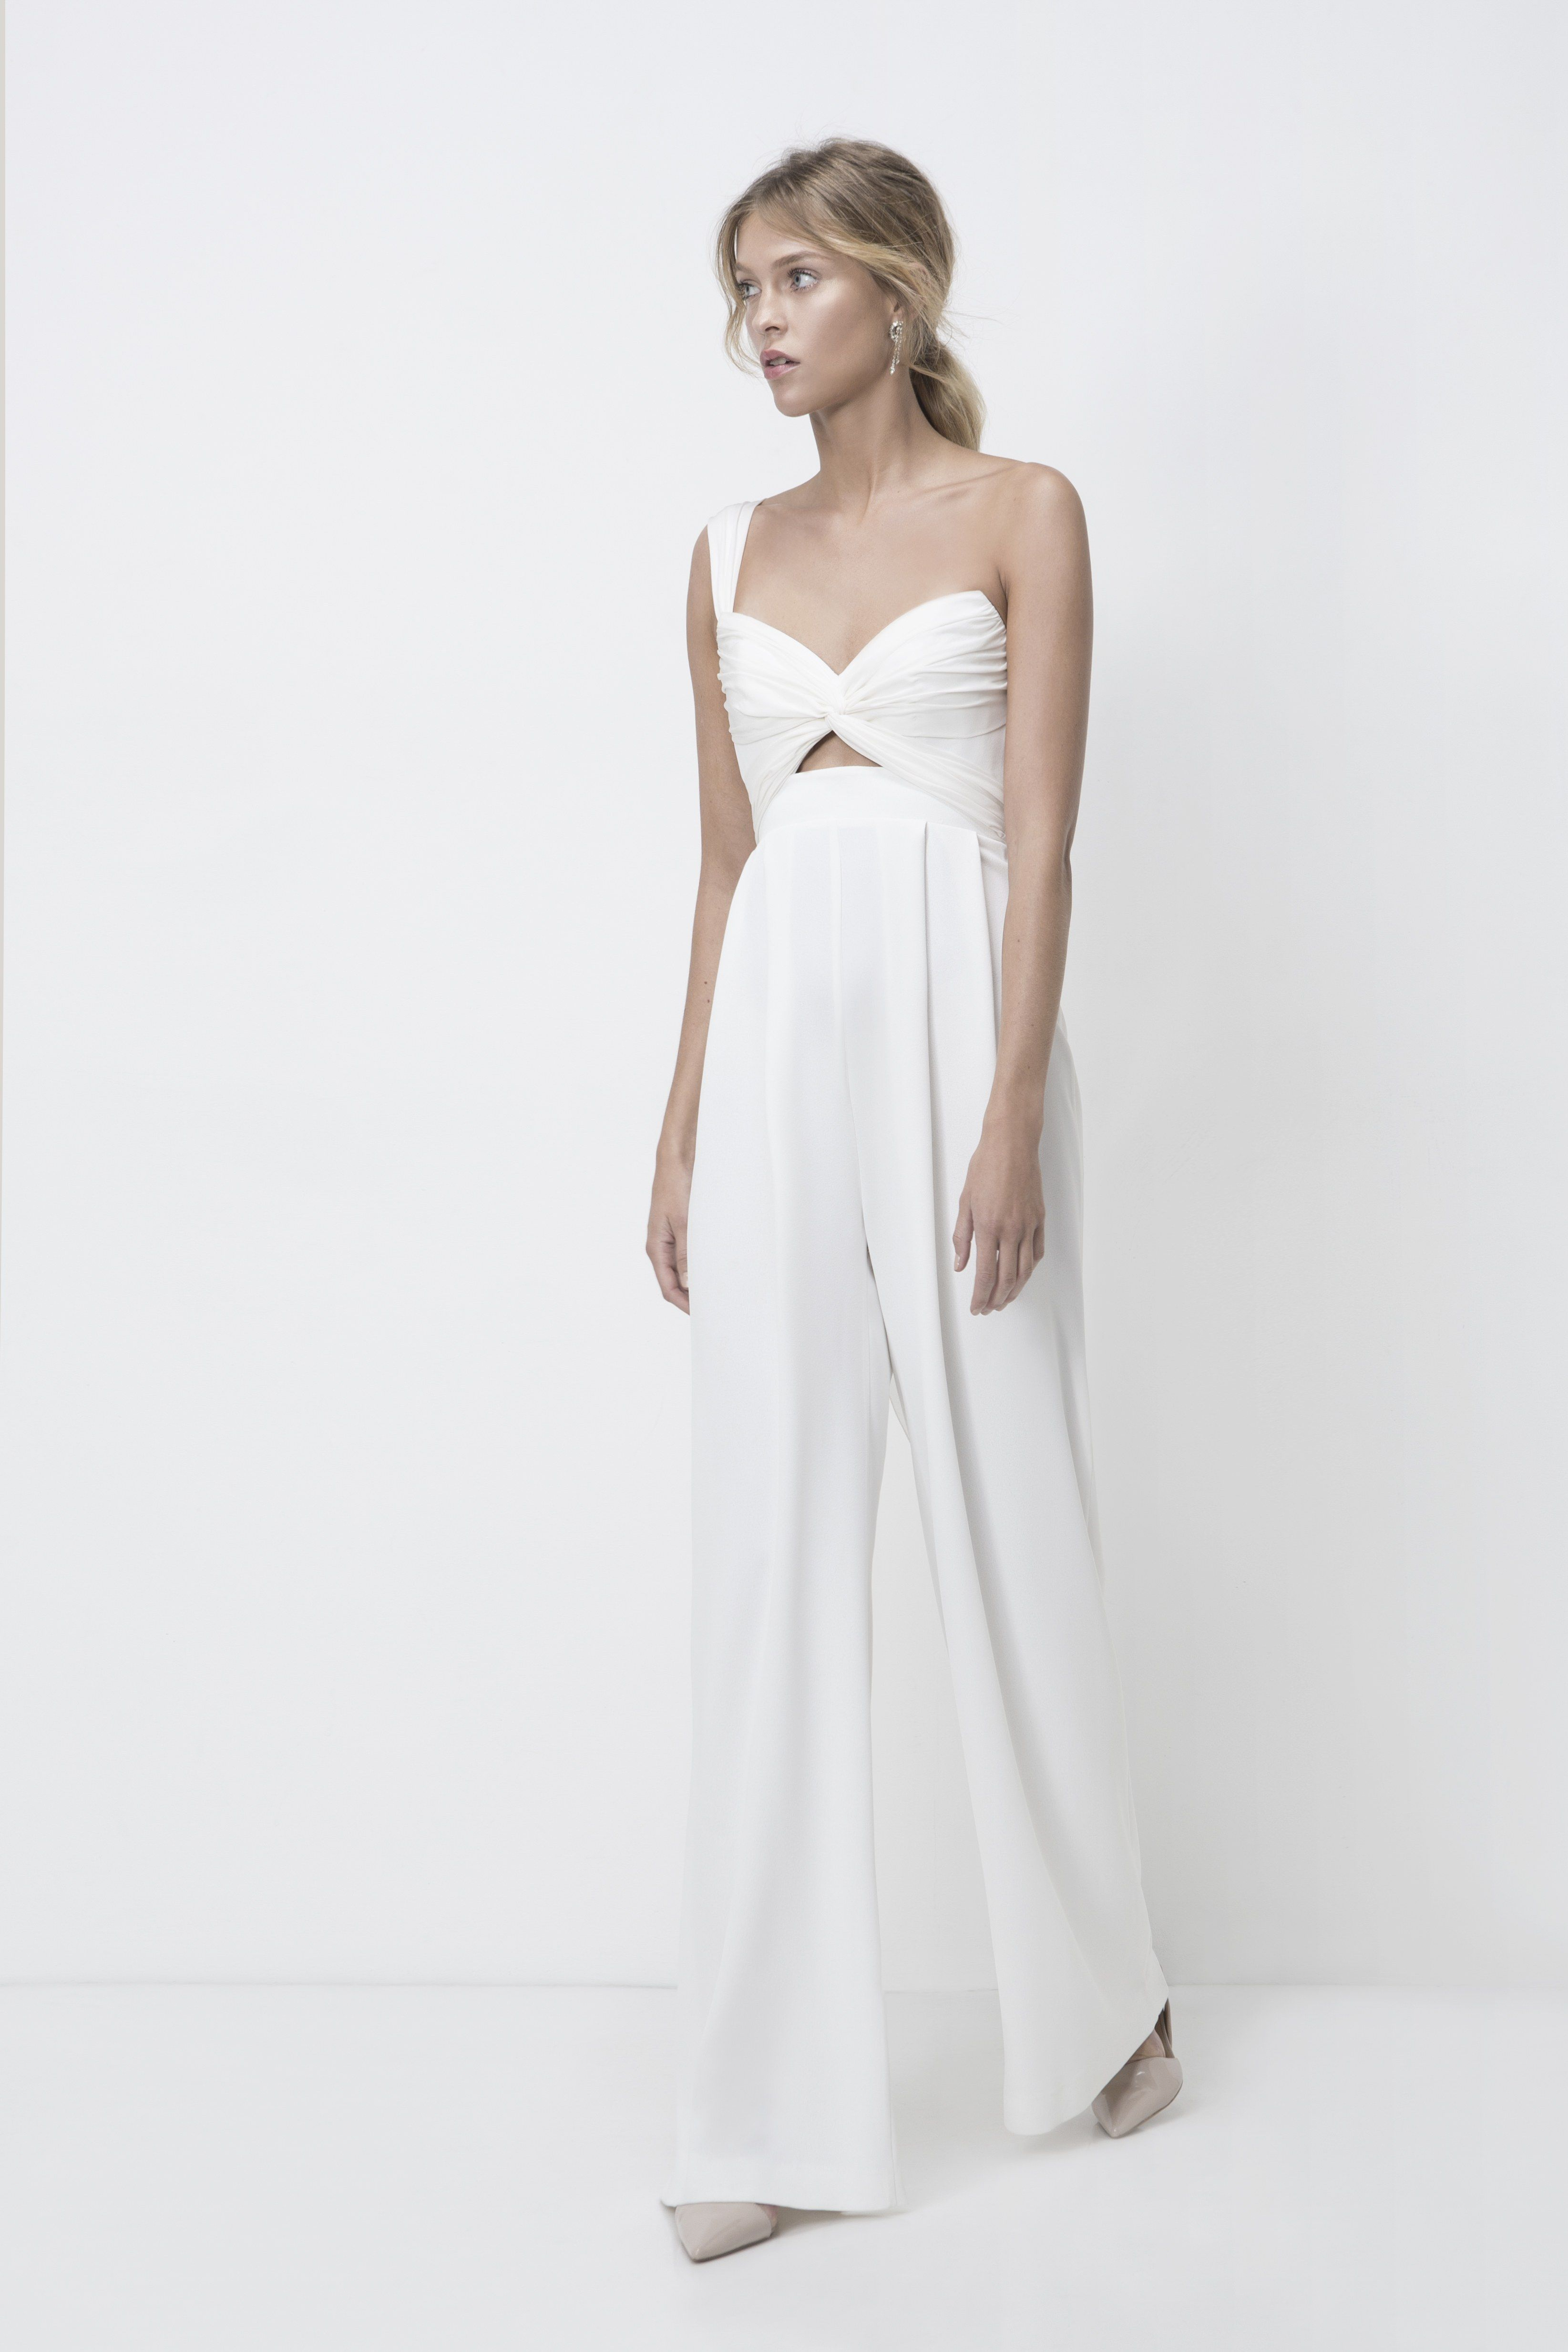 Lihi hod modern bride pinterest wedding dress trends